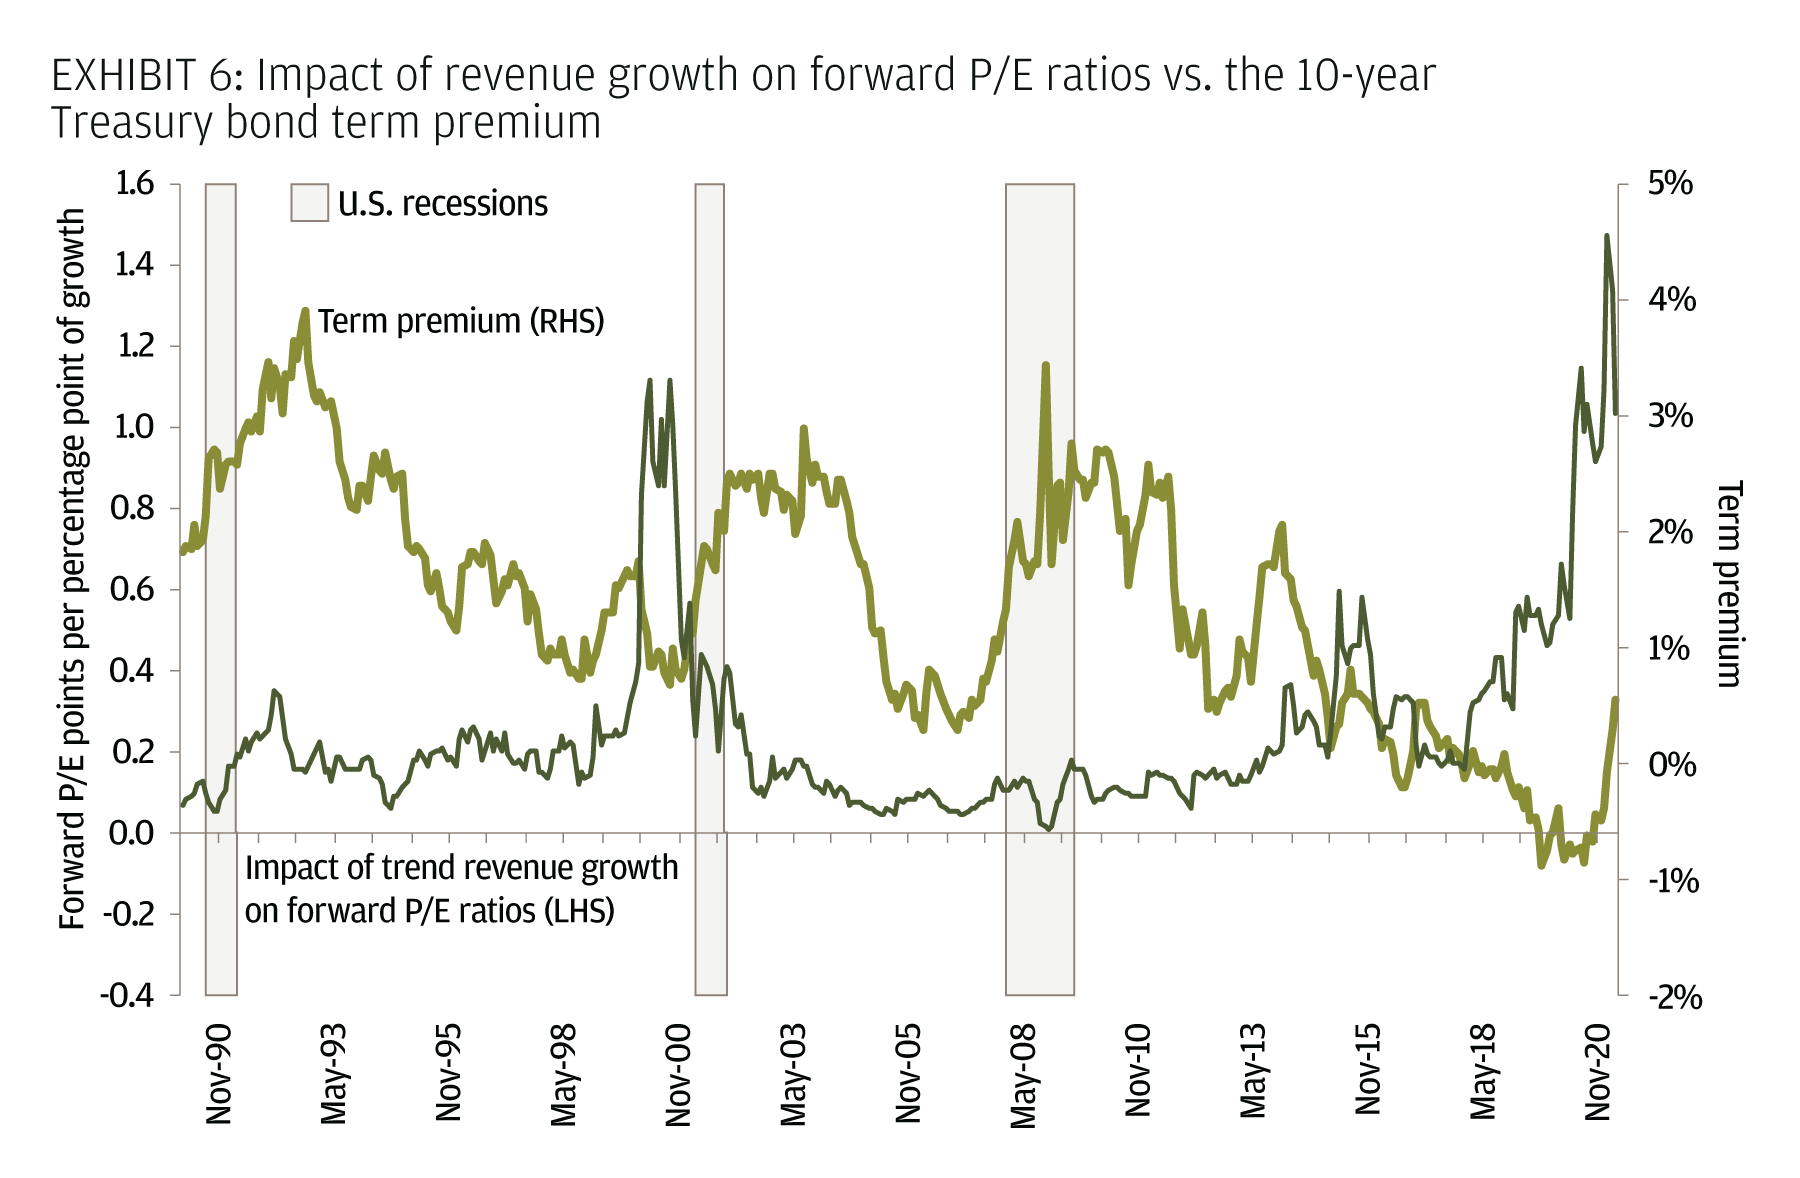 Impact of revenue growth